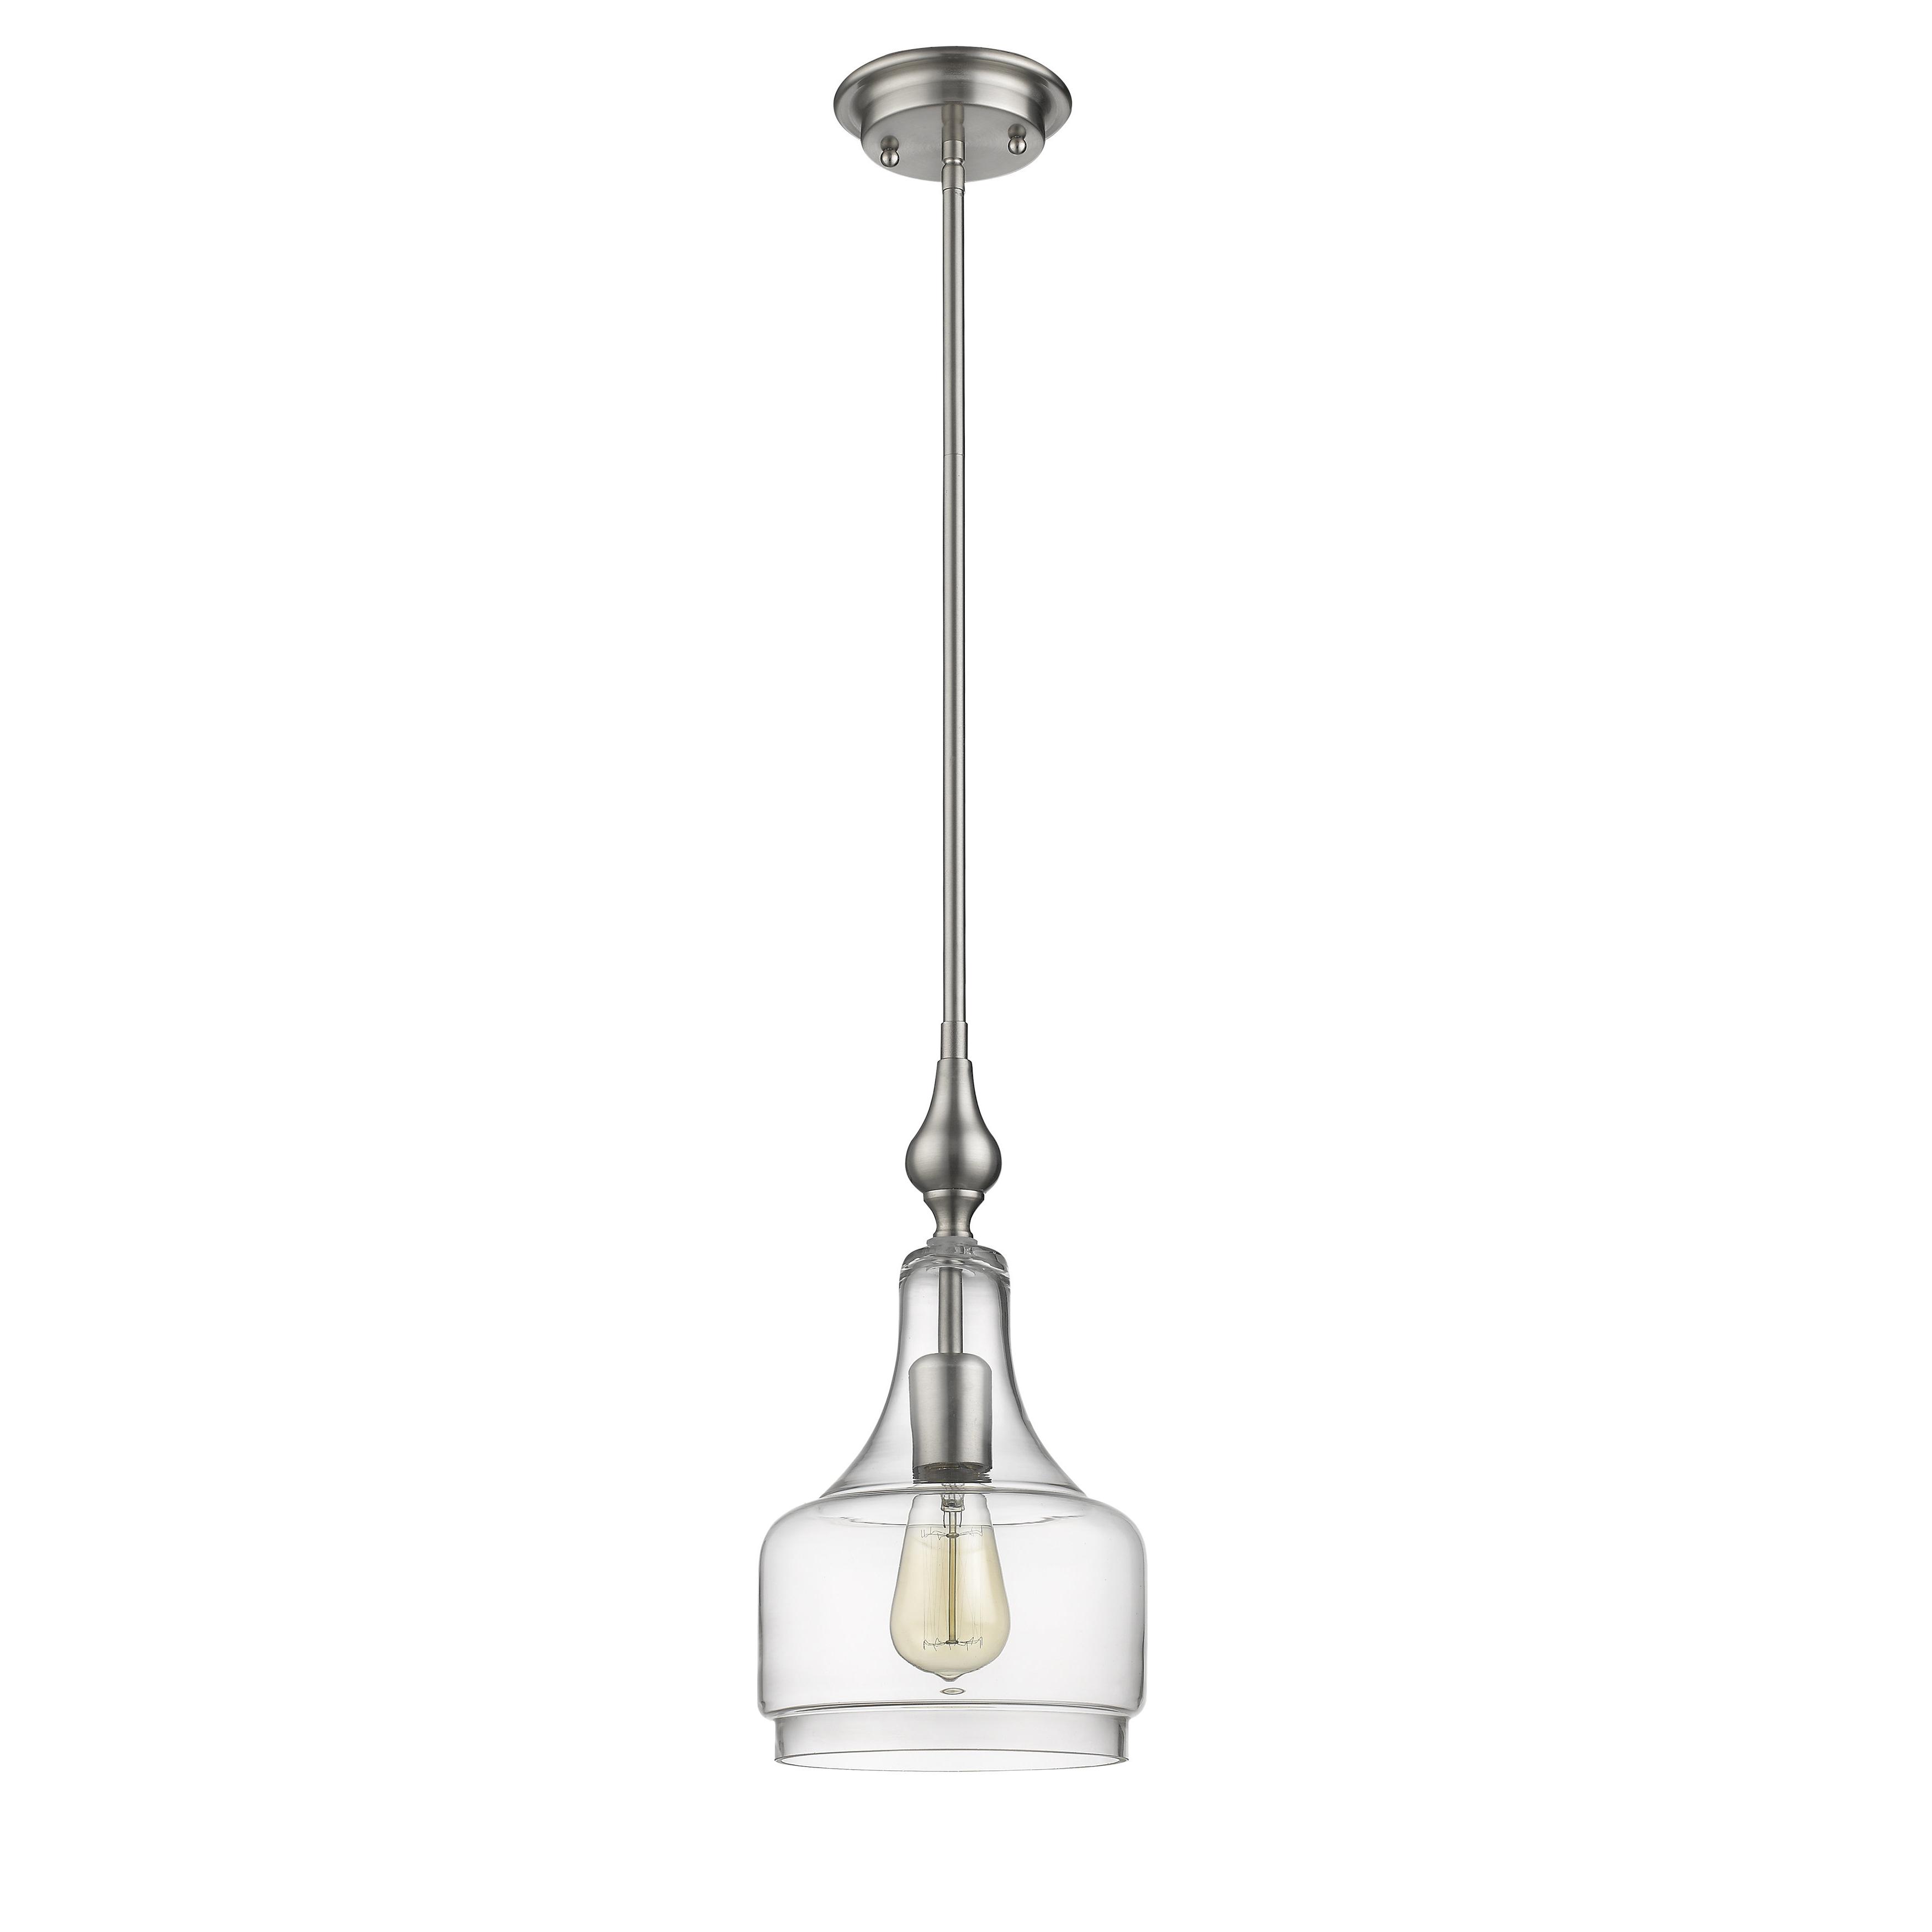 Carey 1 Light Single Bell Pendants Inside 2019 Dunson 1 Light Single Bell Pendant (View 4 of 20)